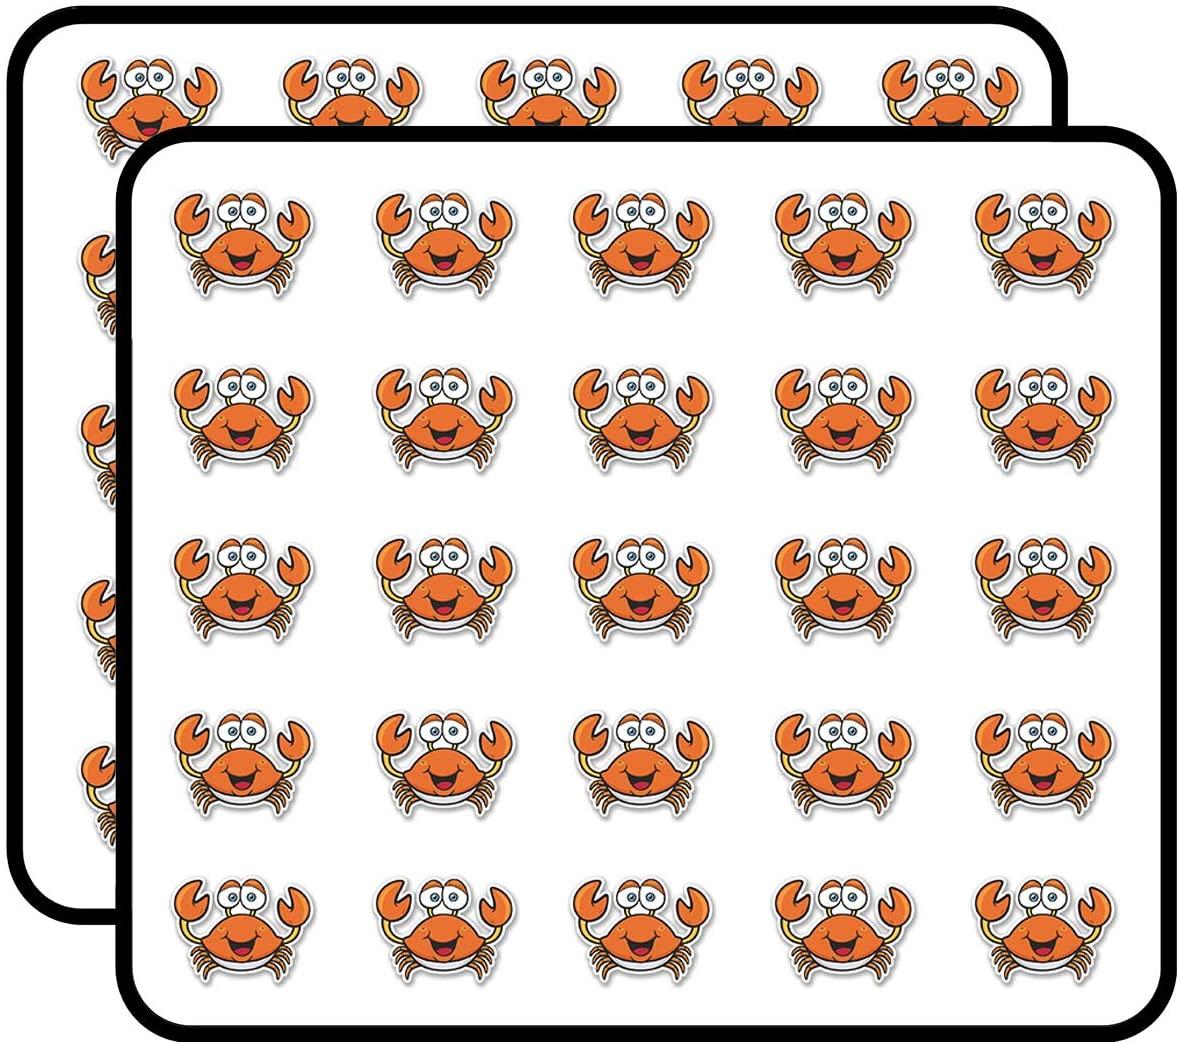 Happy Crab Sticker for Scrapbooking, Calendars, Arts, Kids DIY Crafts, Album, Bullet Journals 50 Pack